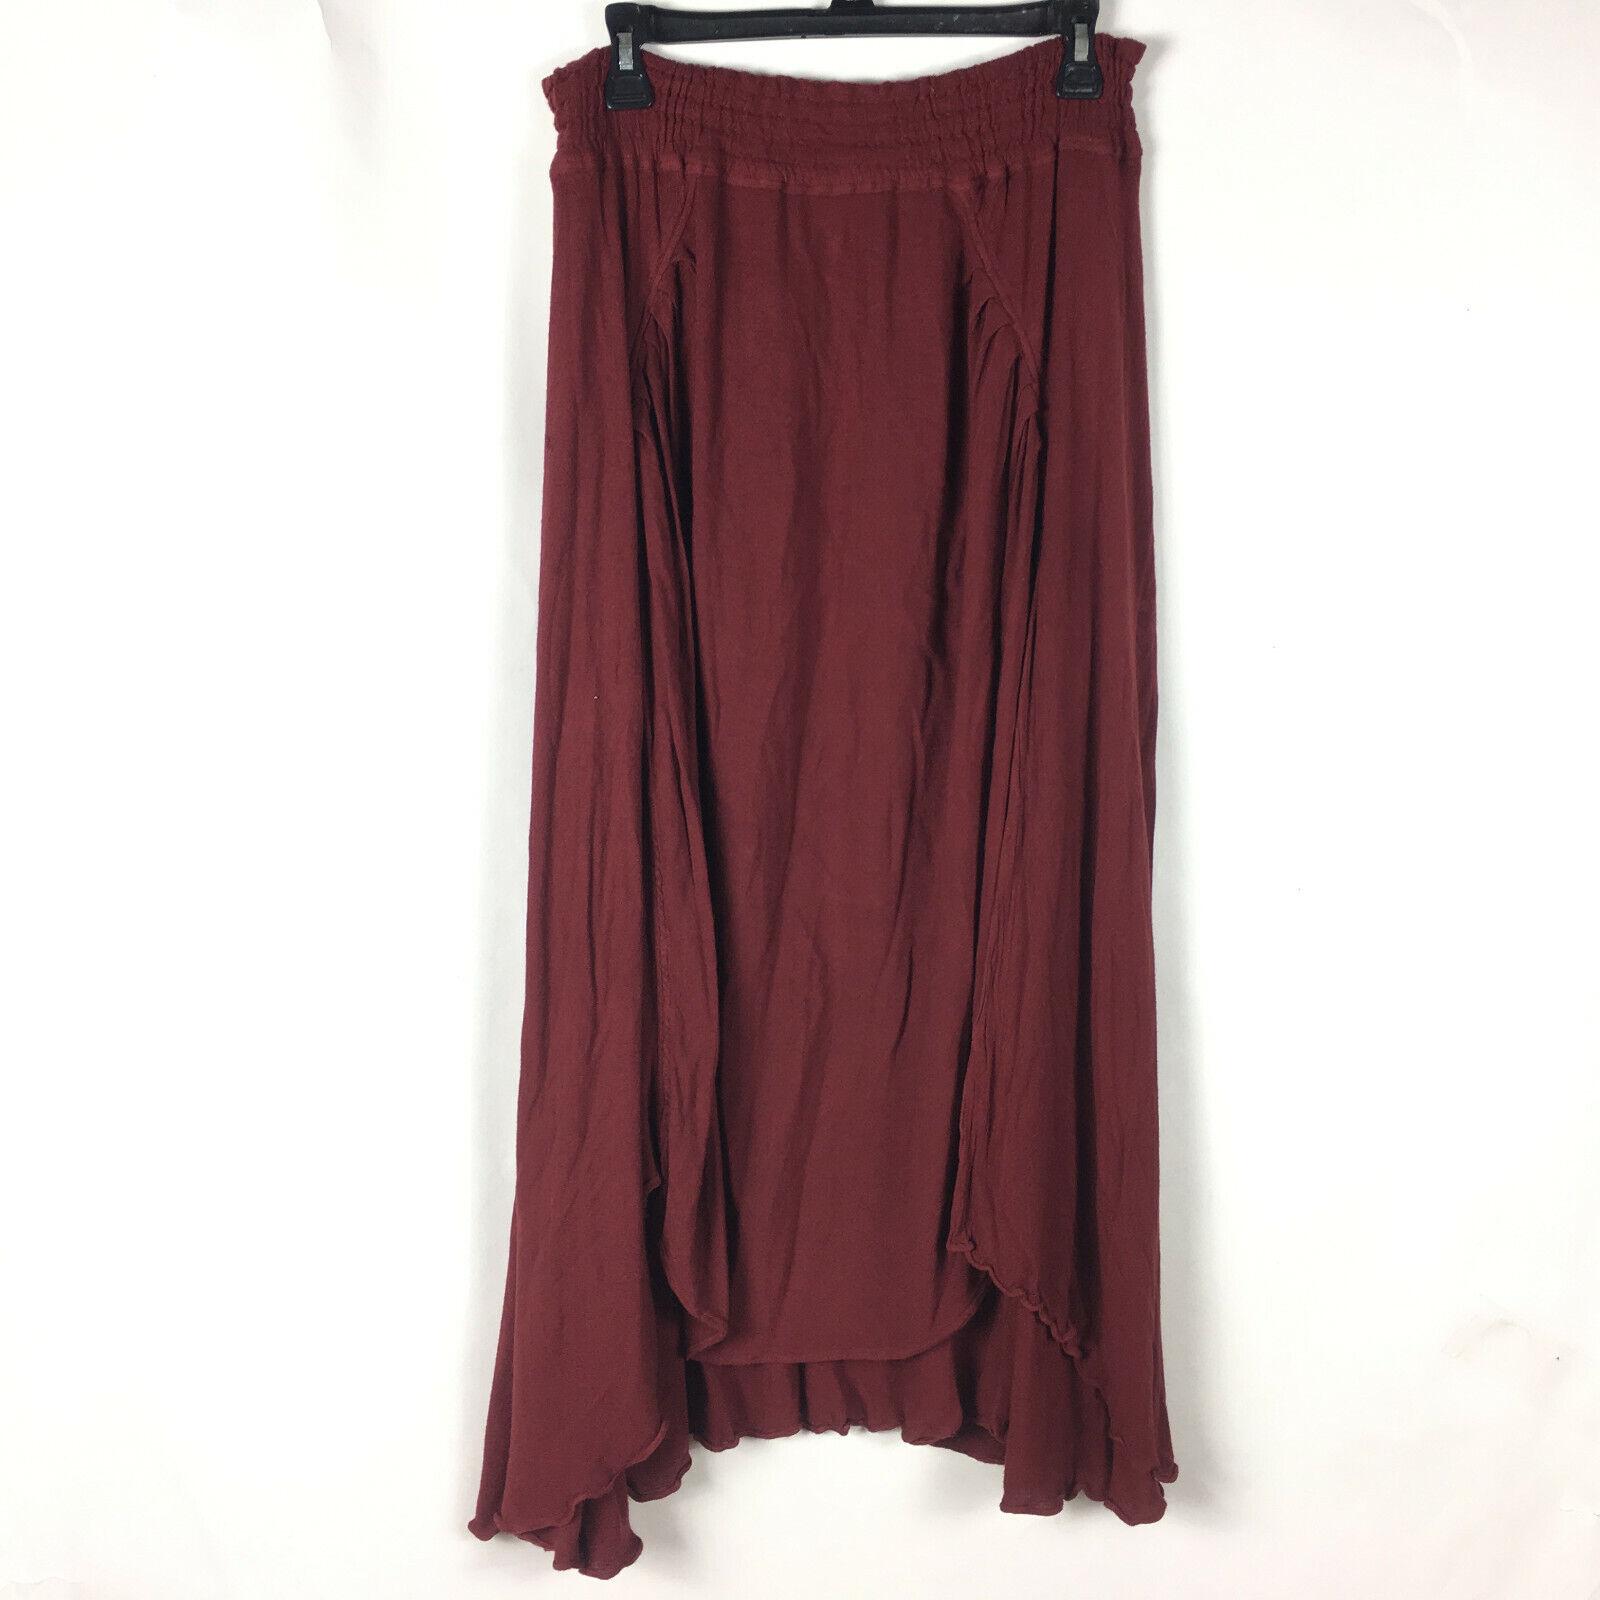 Laise Adzer Skirt Women's Small Medium Large Lage… - image 3